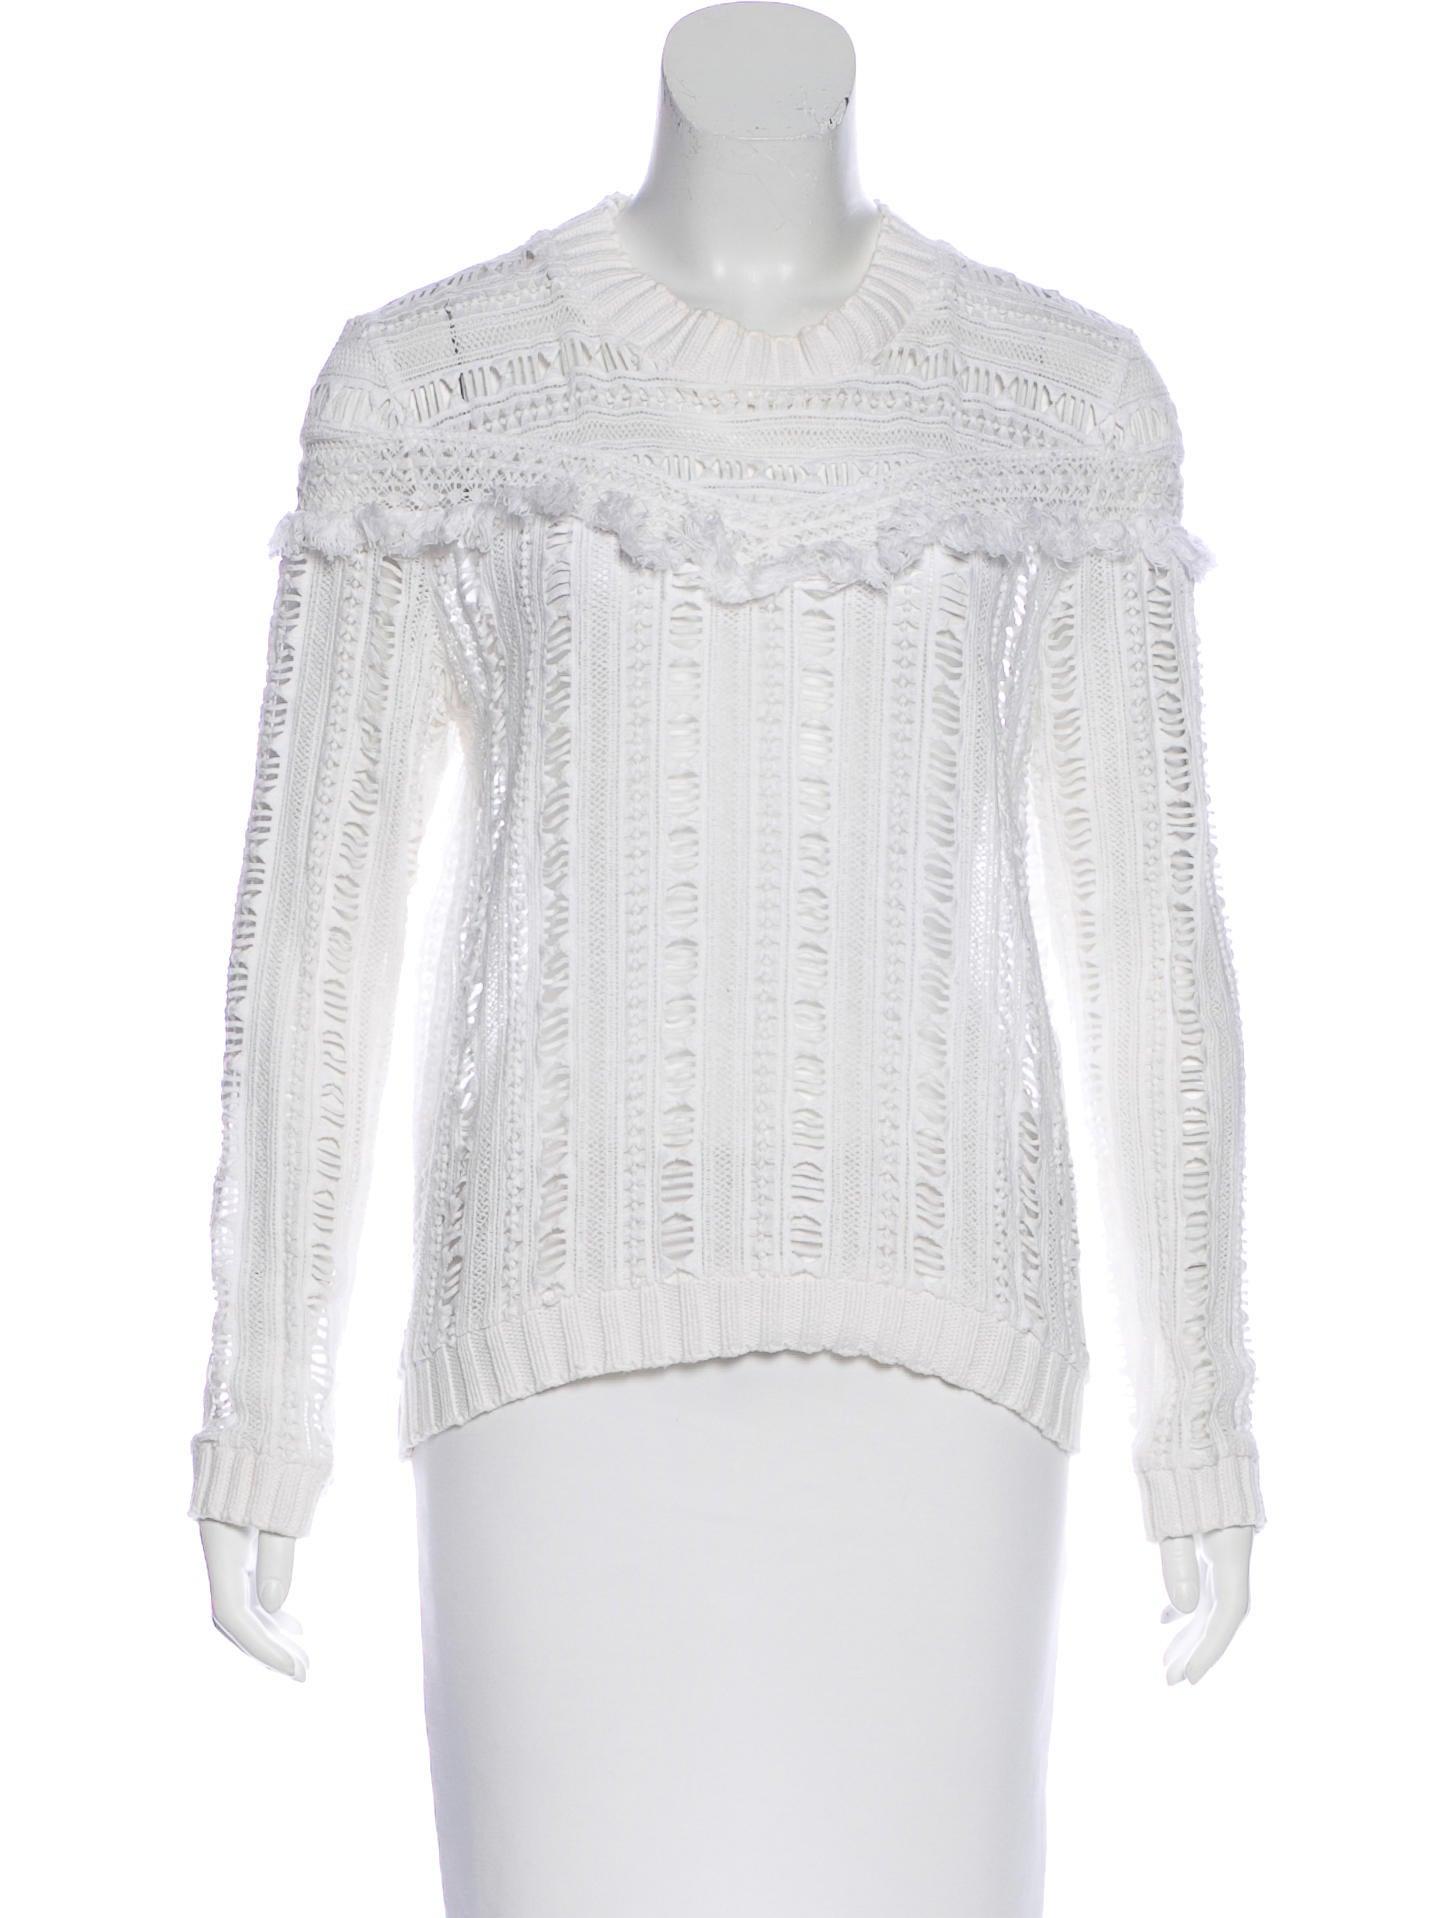 Sea Long Sleeve Open Knit Sweater - Clothing - WSSEA23622   The ...